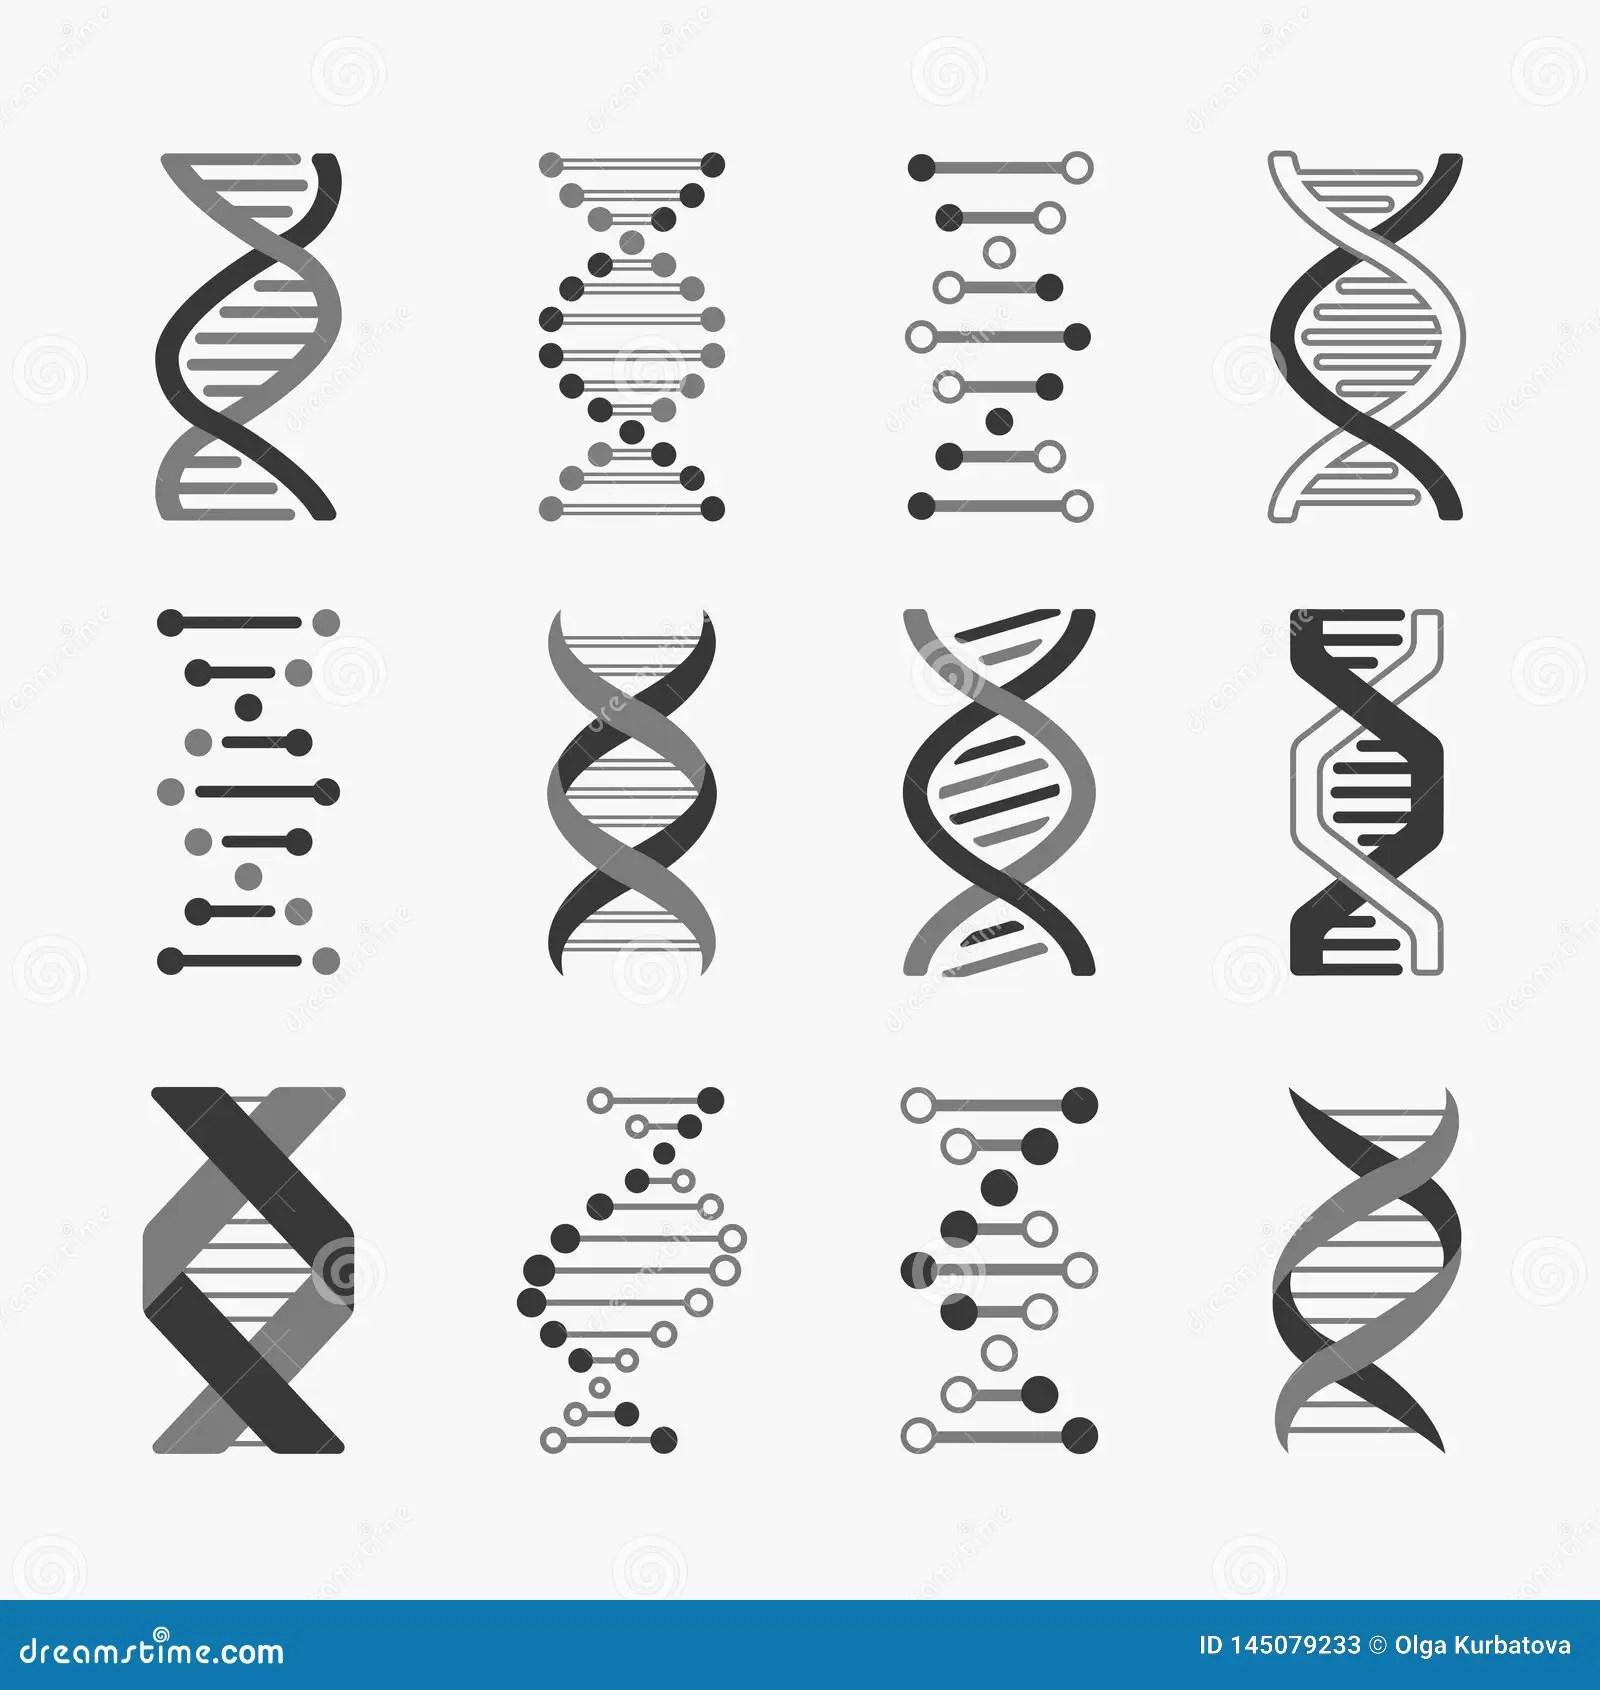 Dna Helix Cell Gene Structure Bioinformatics Spiral